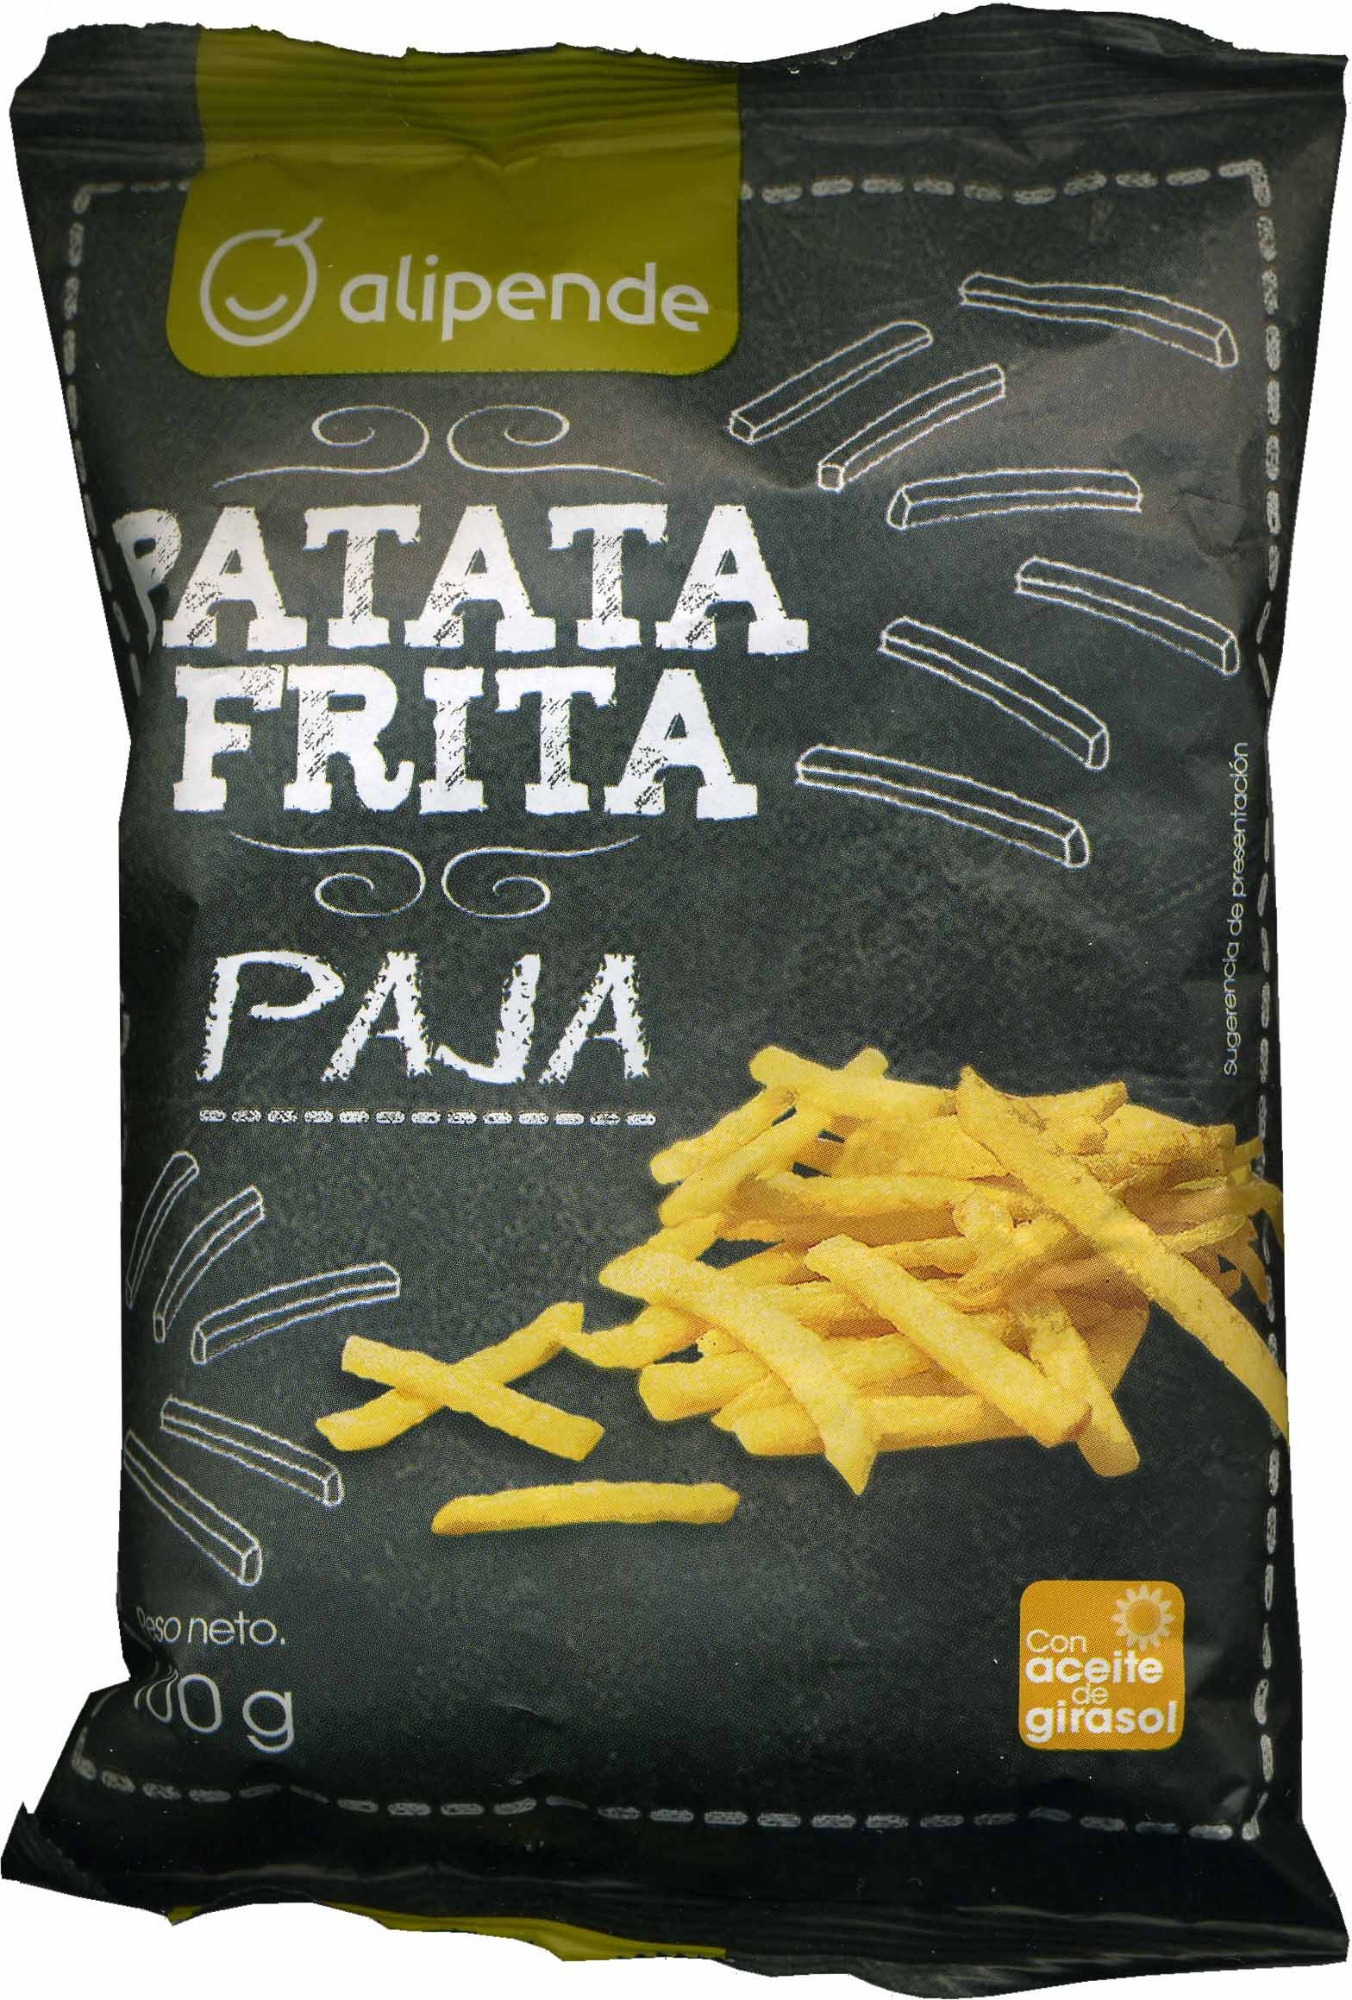 Patata frita paja - Producto - es